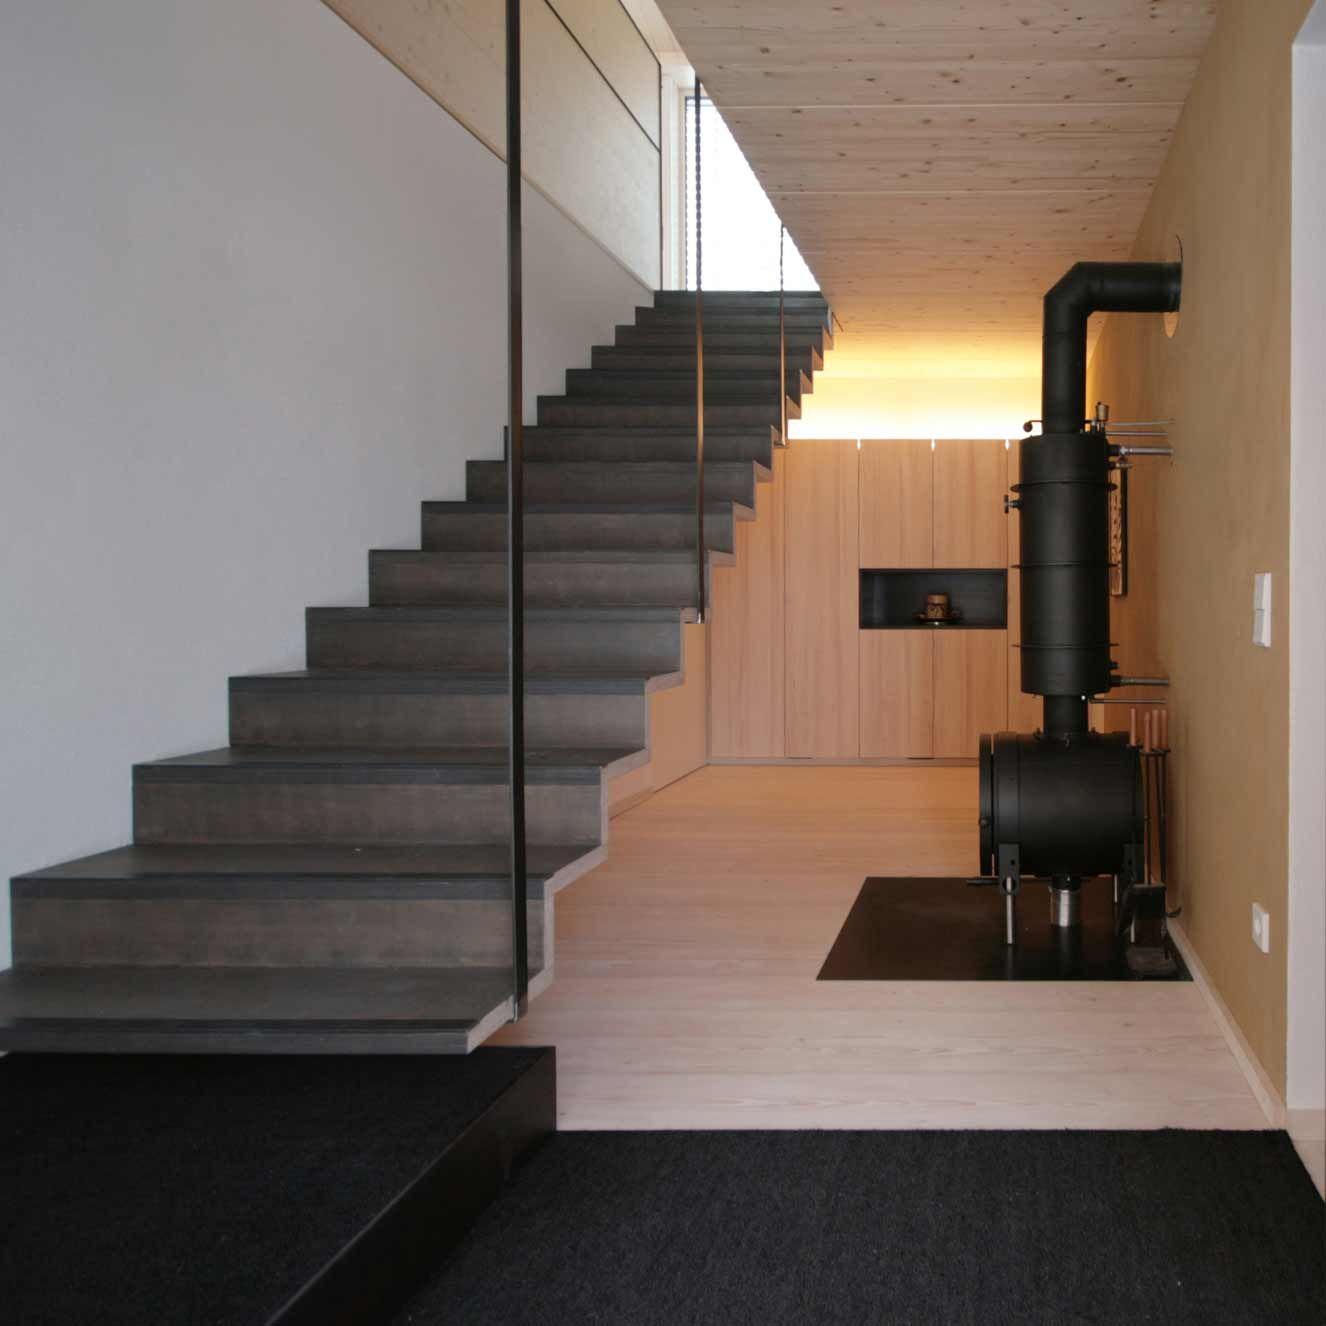 Haus Kohlmeier, Arc Architekten Partnerschaft